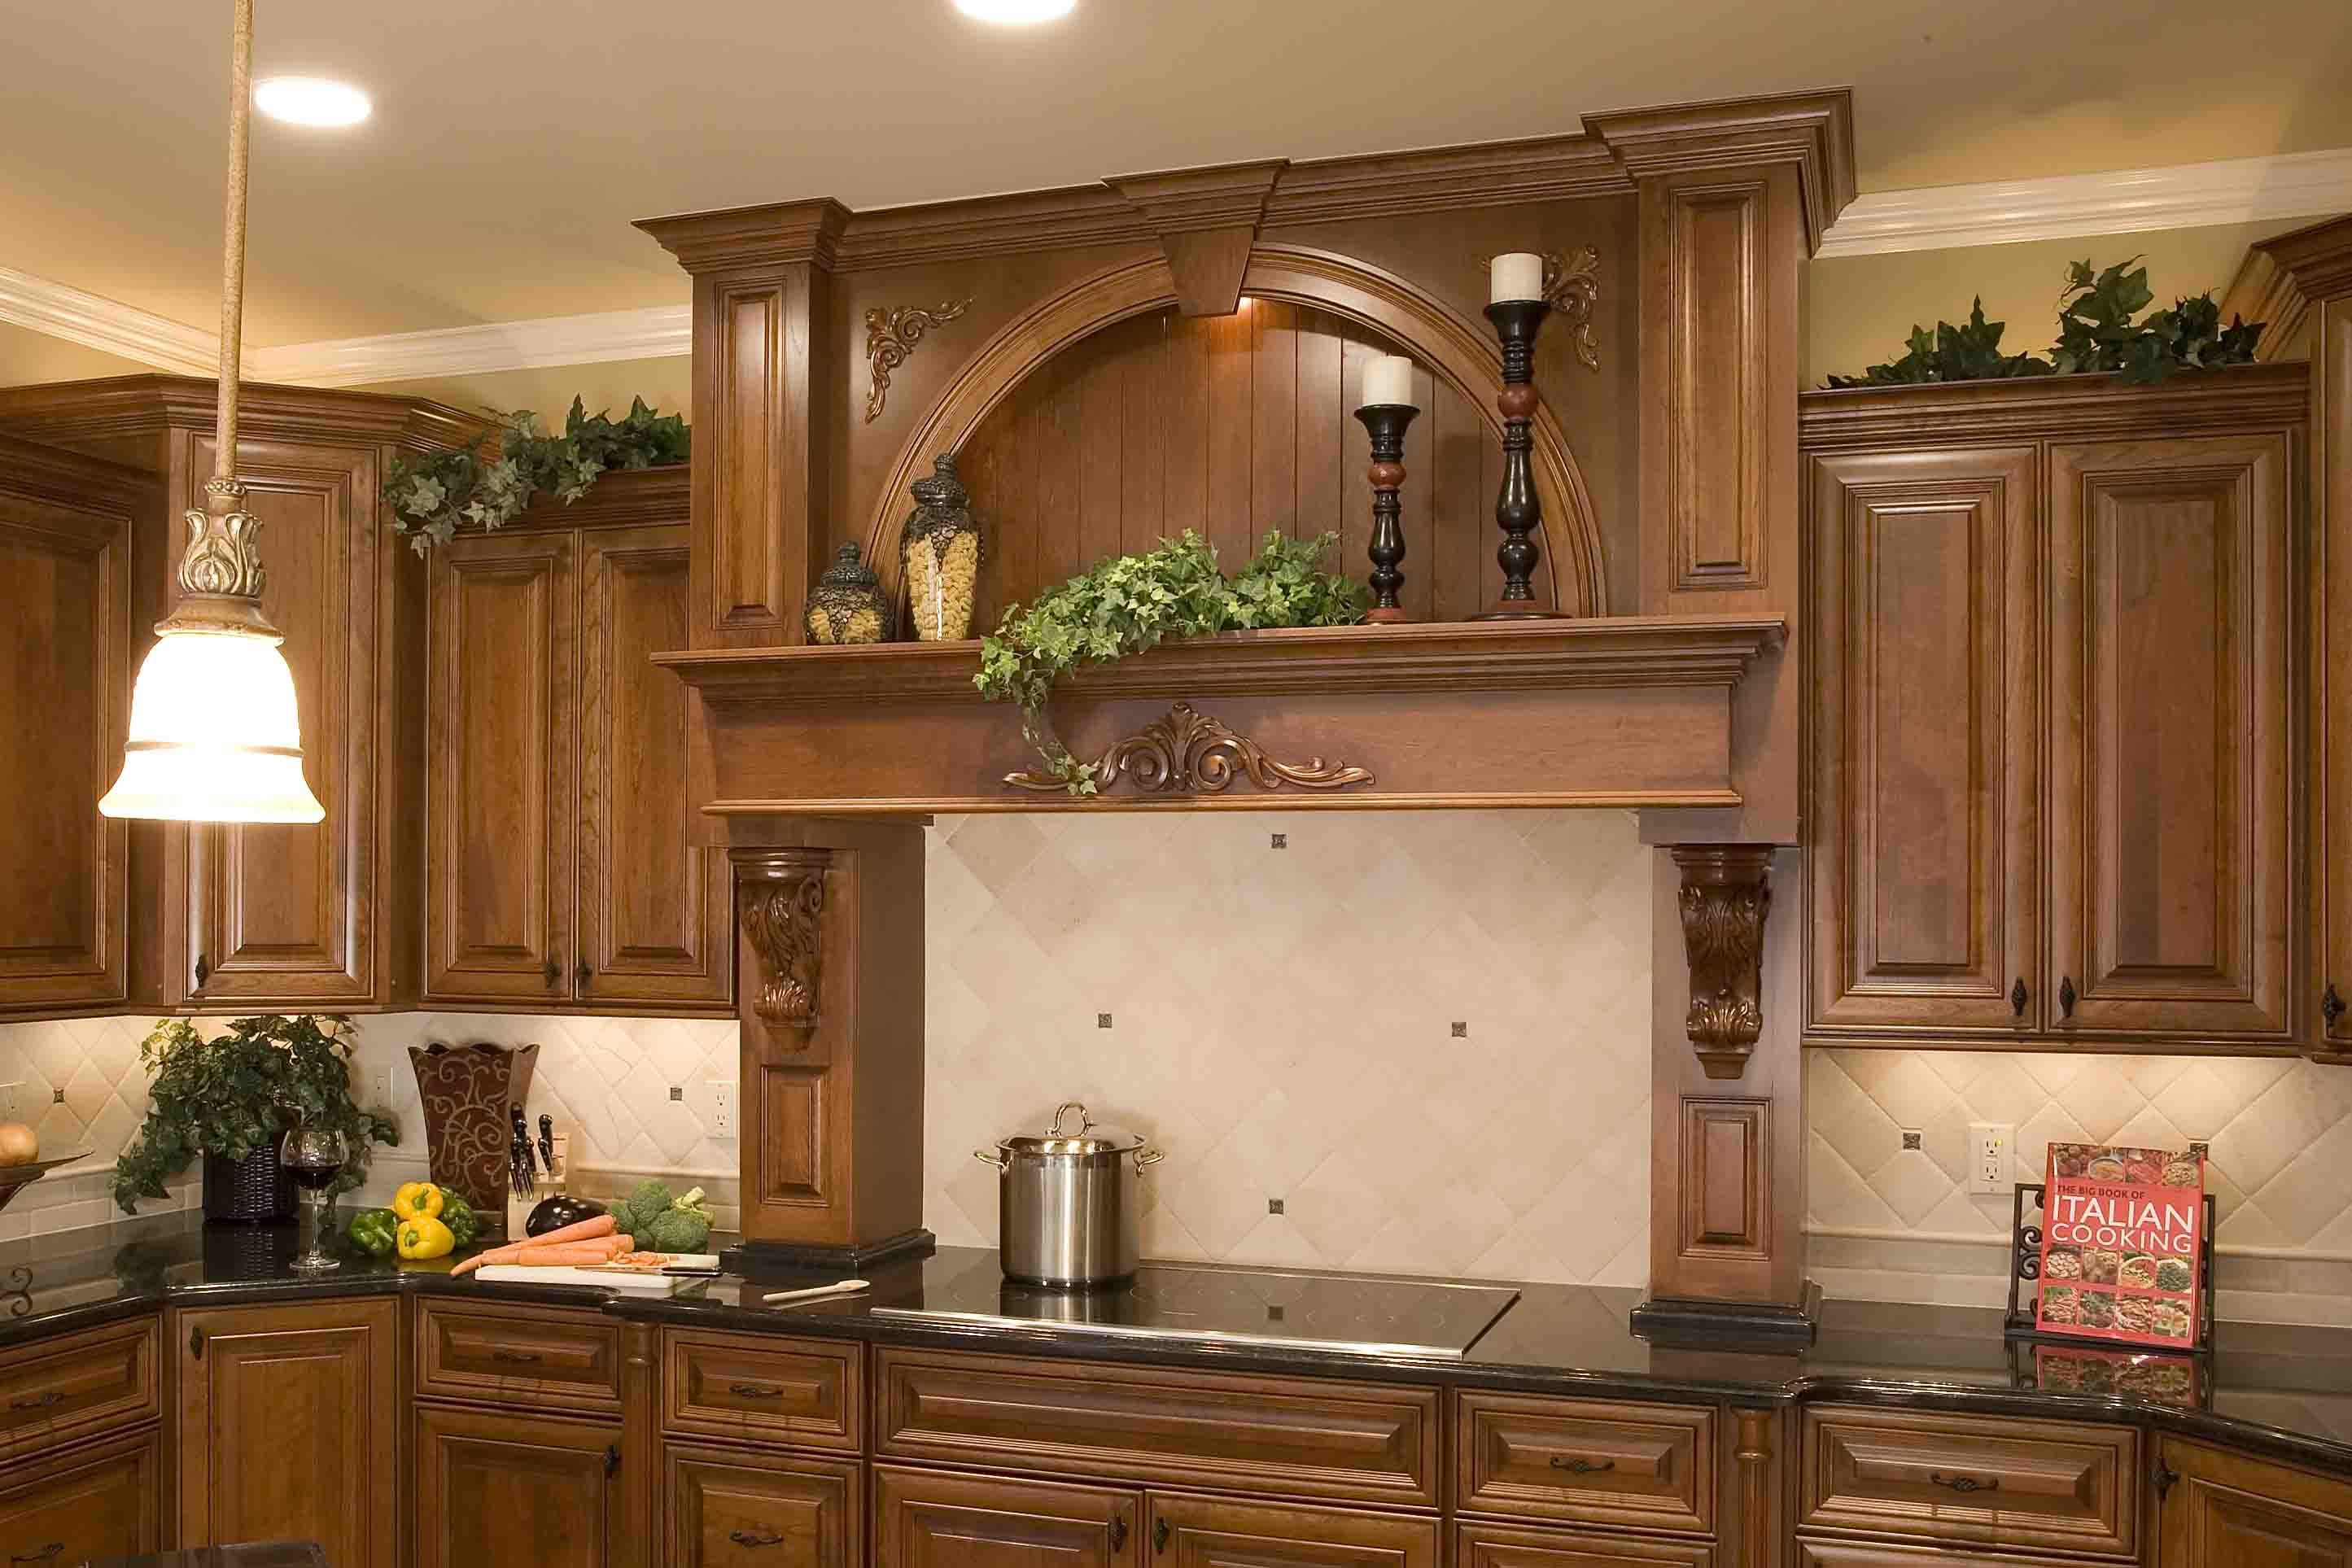 Kitchen Cabinet Over Stove | Wood Range Hood With Display Niche